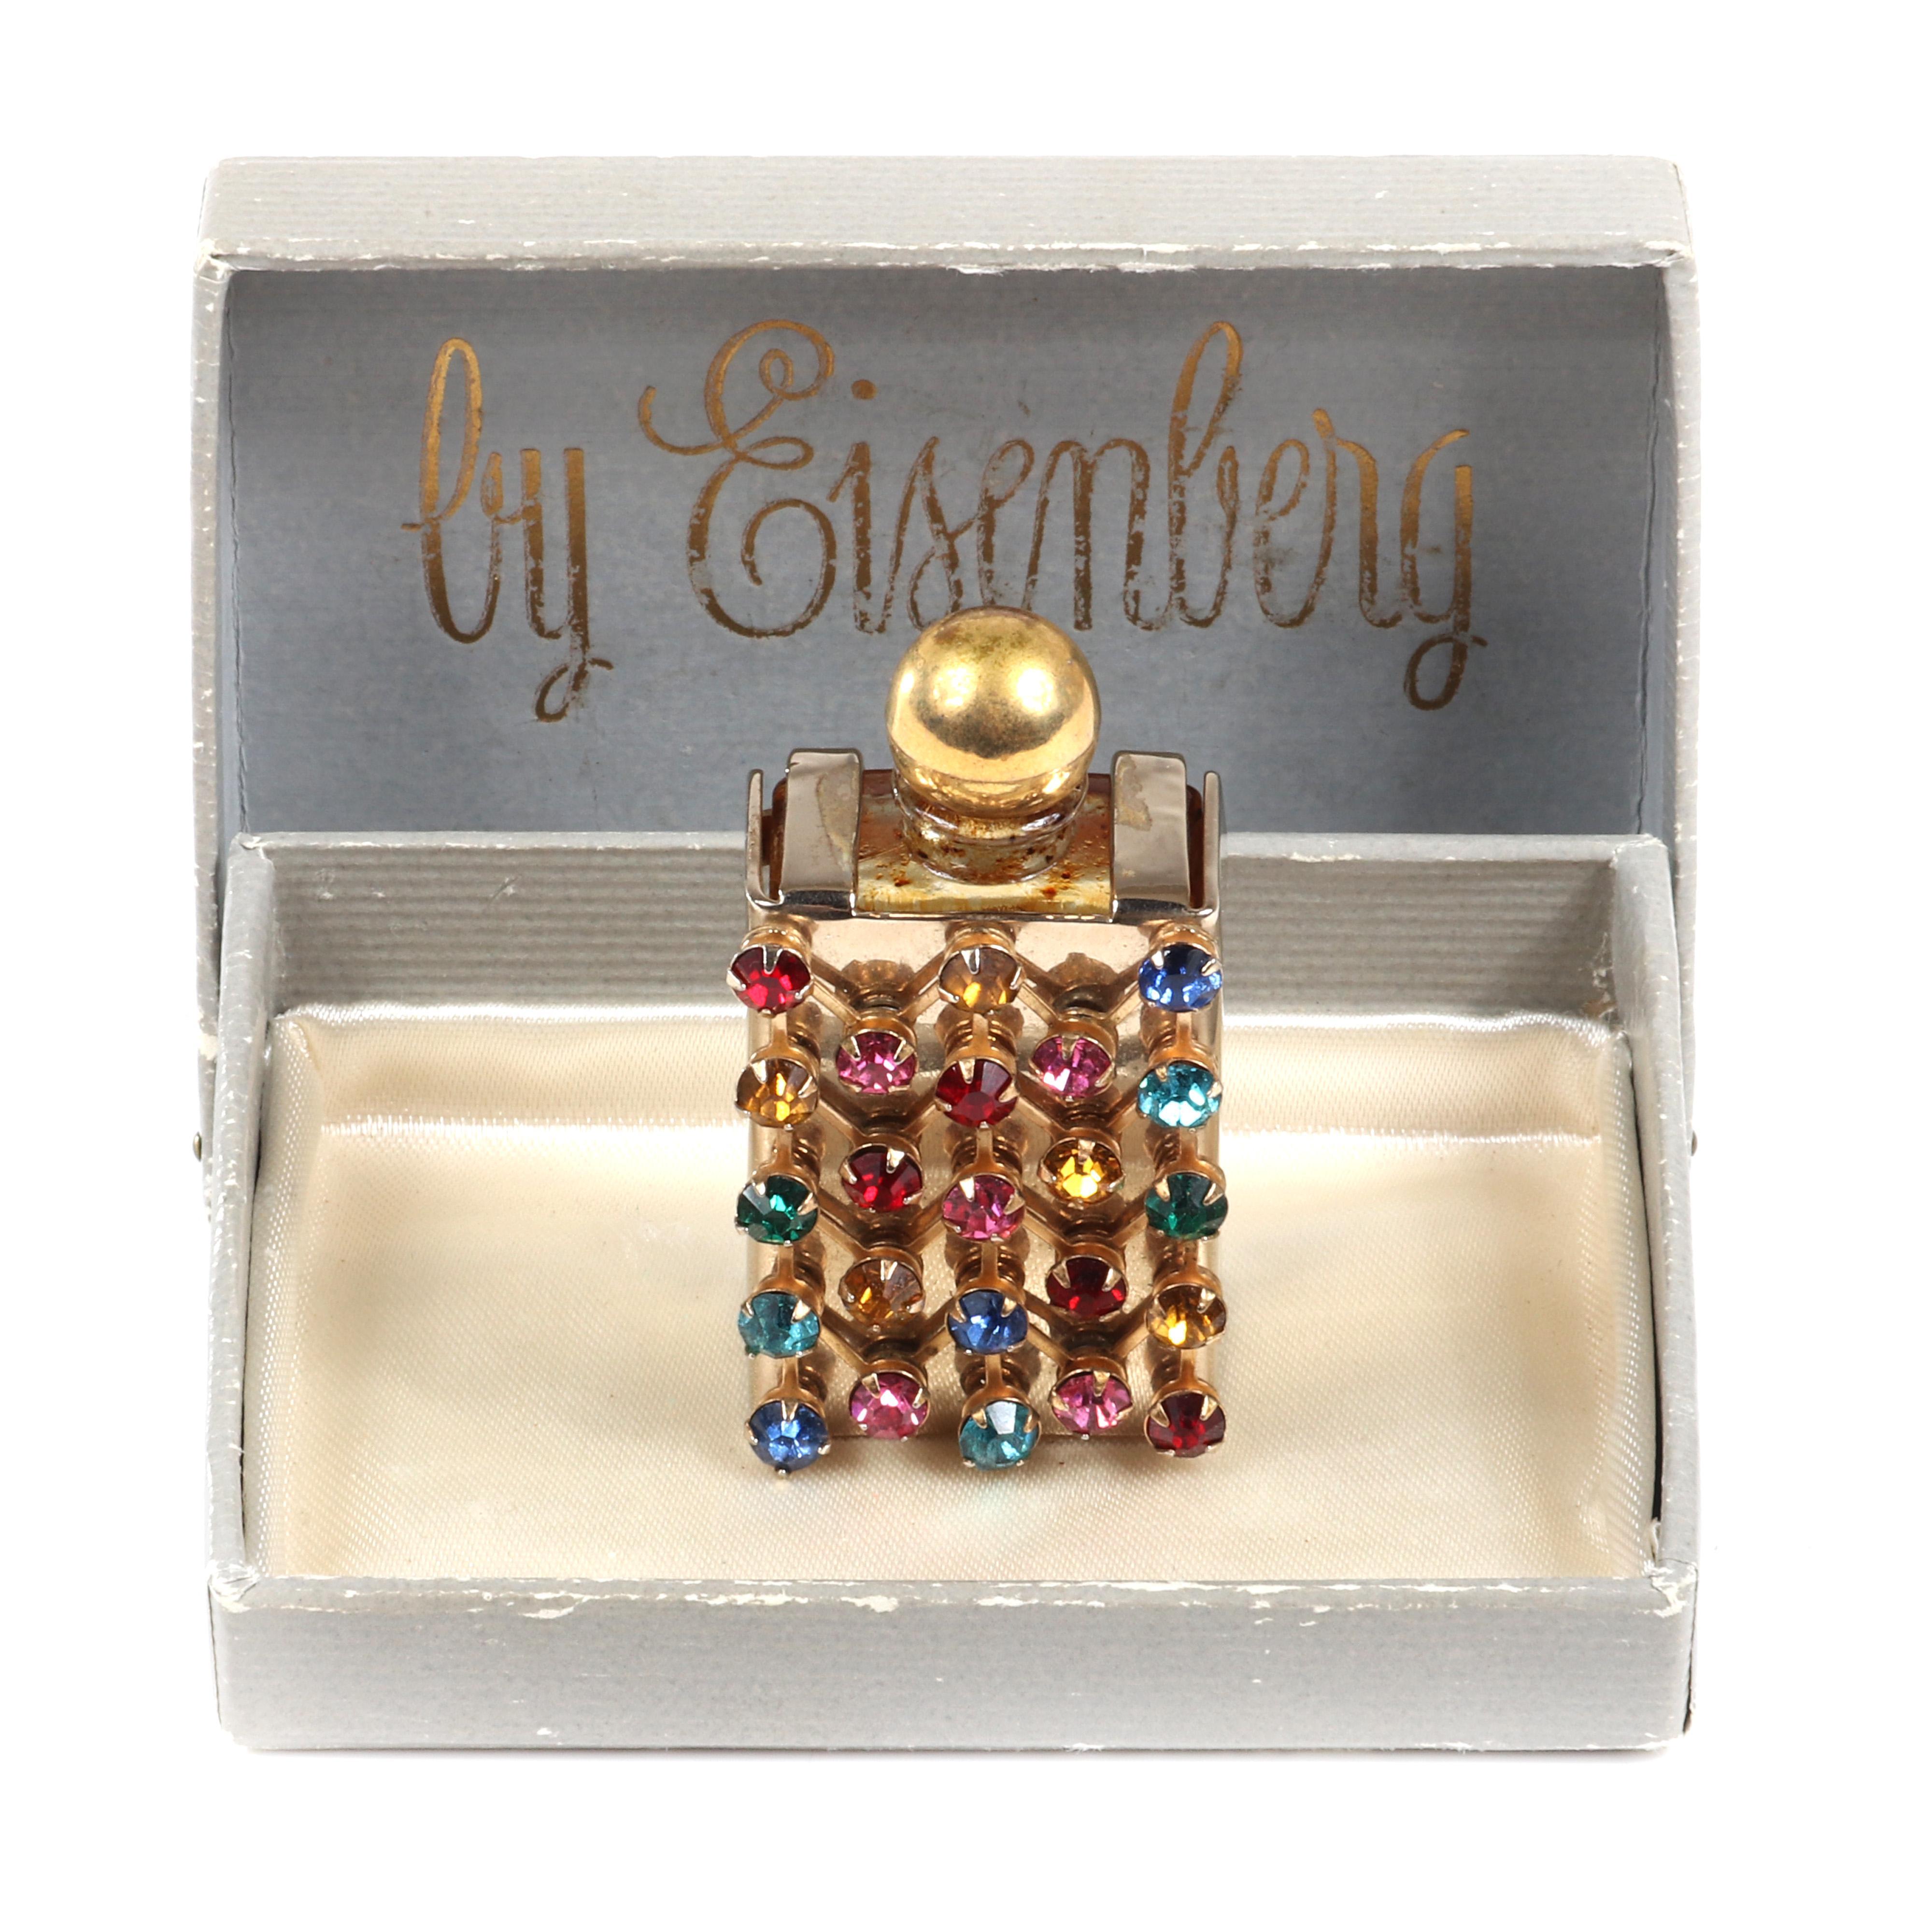 "Eisenberg Originals jeweled perfume bottle in original box with twenty-three jewel-tone, multi-colored, prong-set round rhinestones on gold tone framework, c. 1940s 2 3/4"" x 1"" (bottle)"